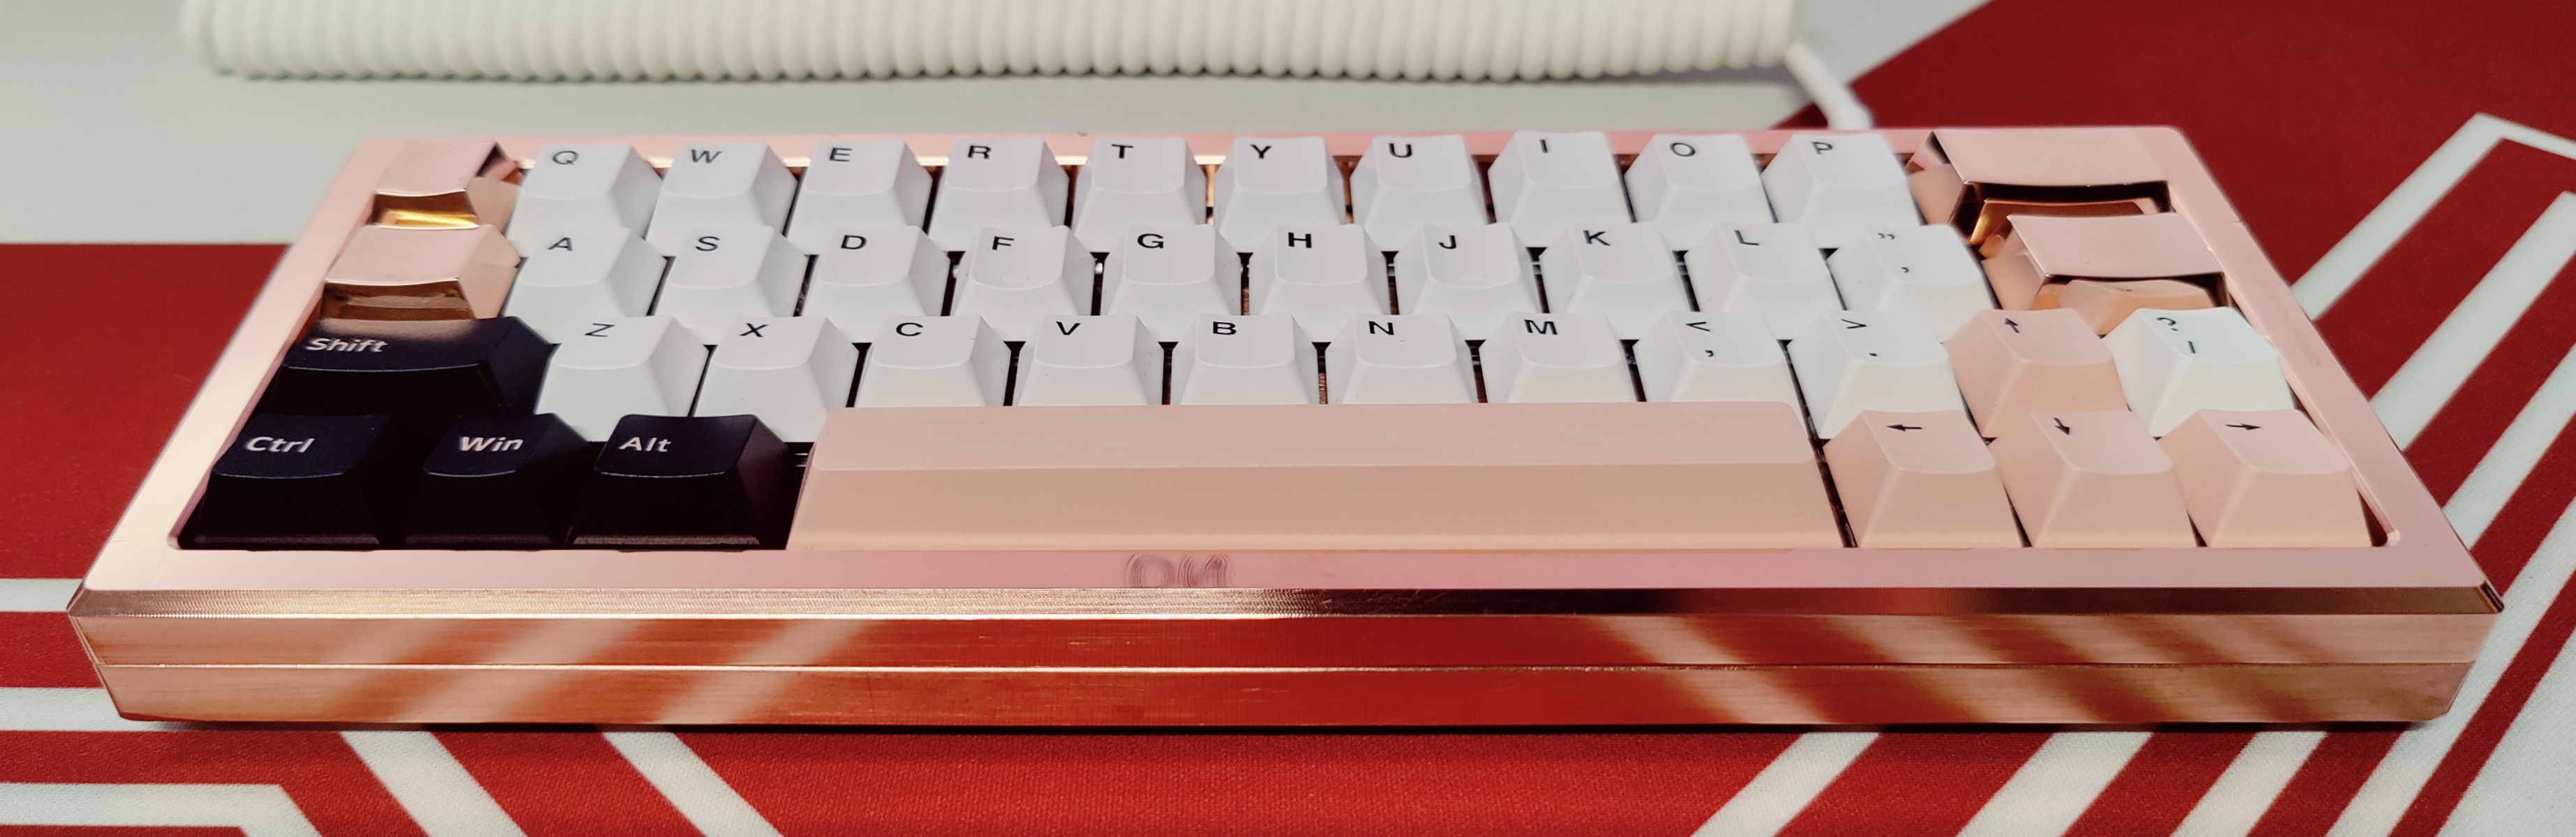 Copper Carpool with Fauxlivia keycaps and custom copper MiniVan keys